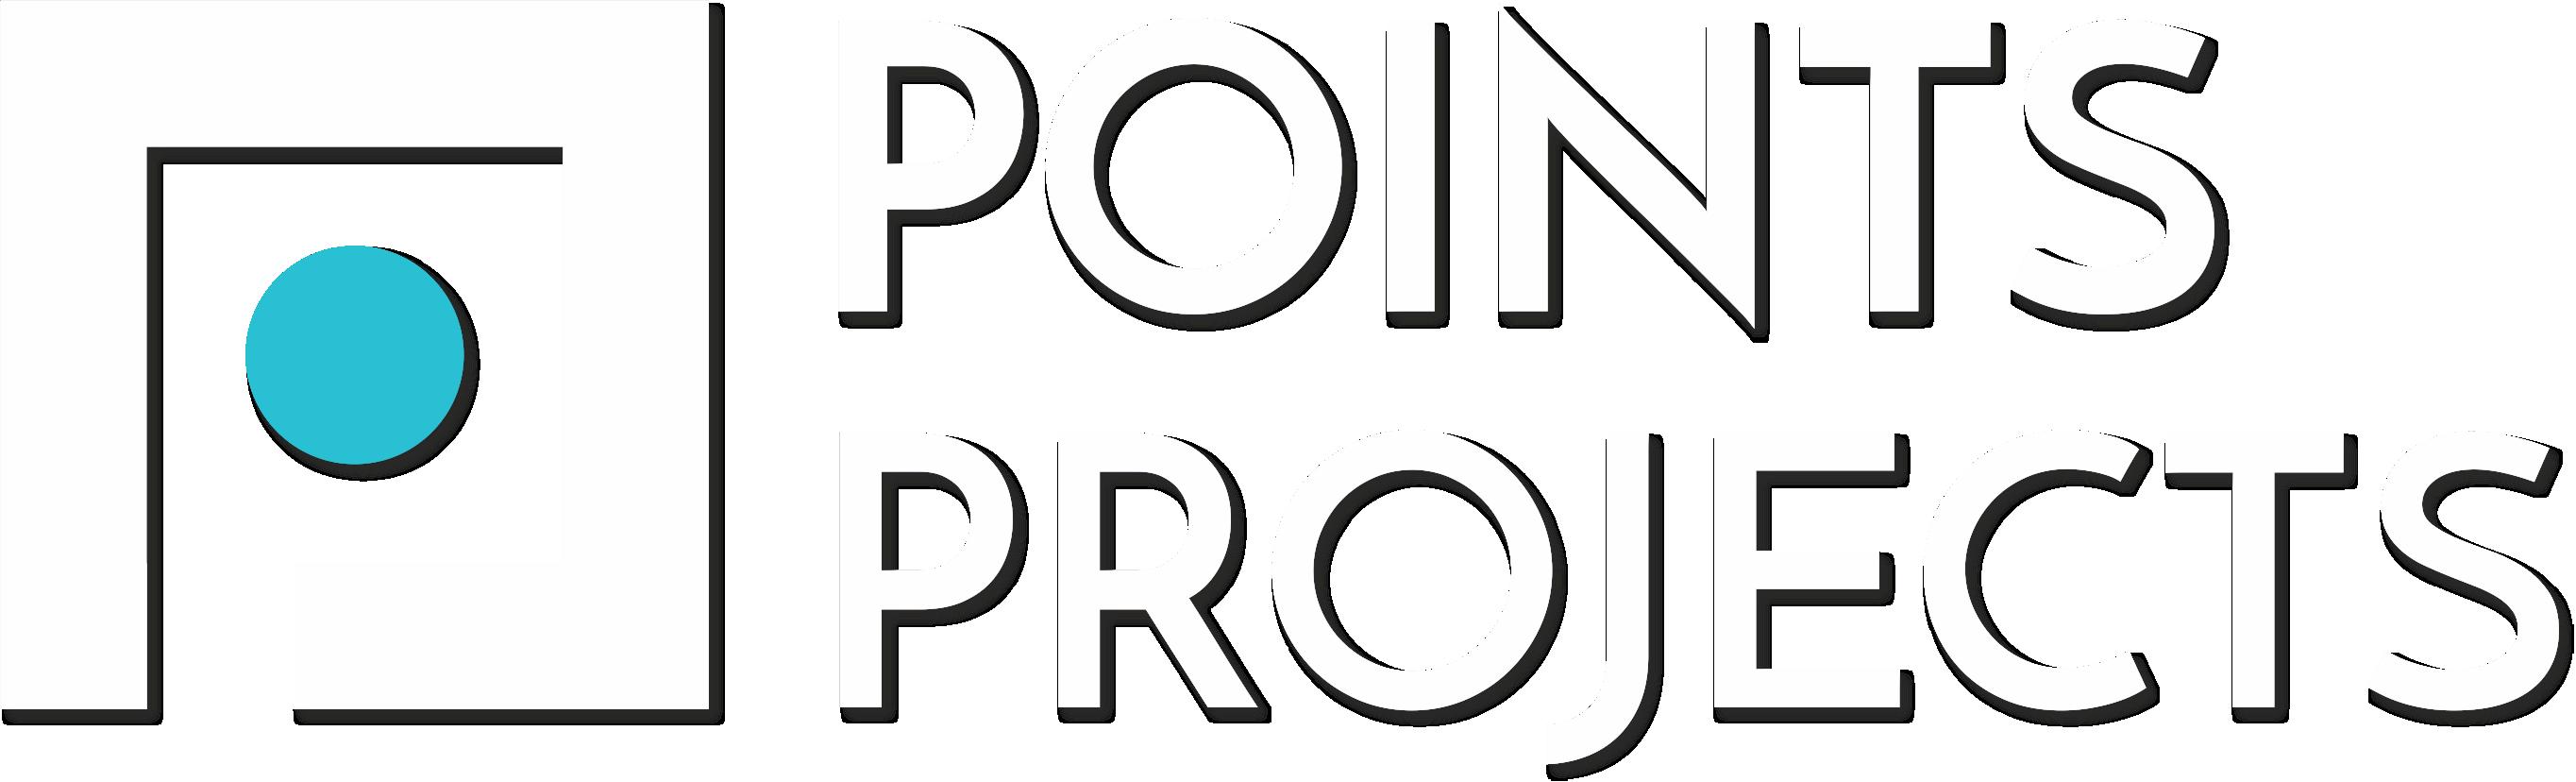 Points-logo-2-1-2